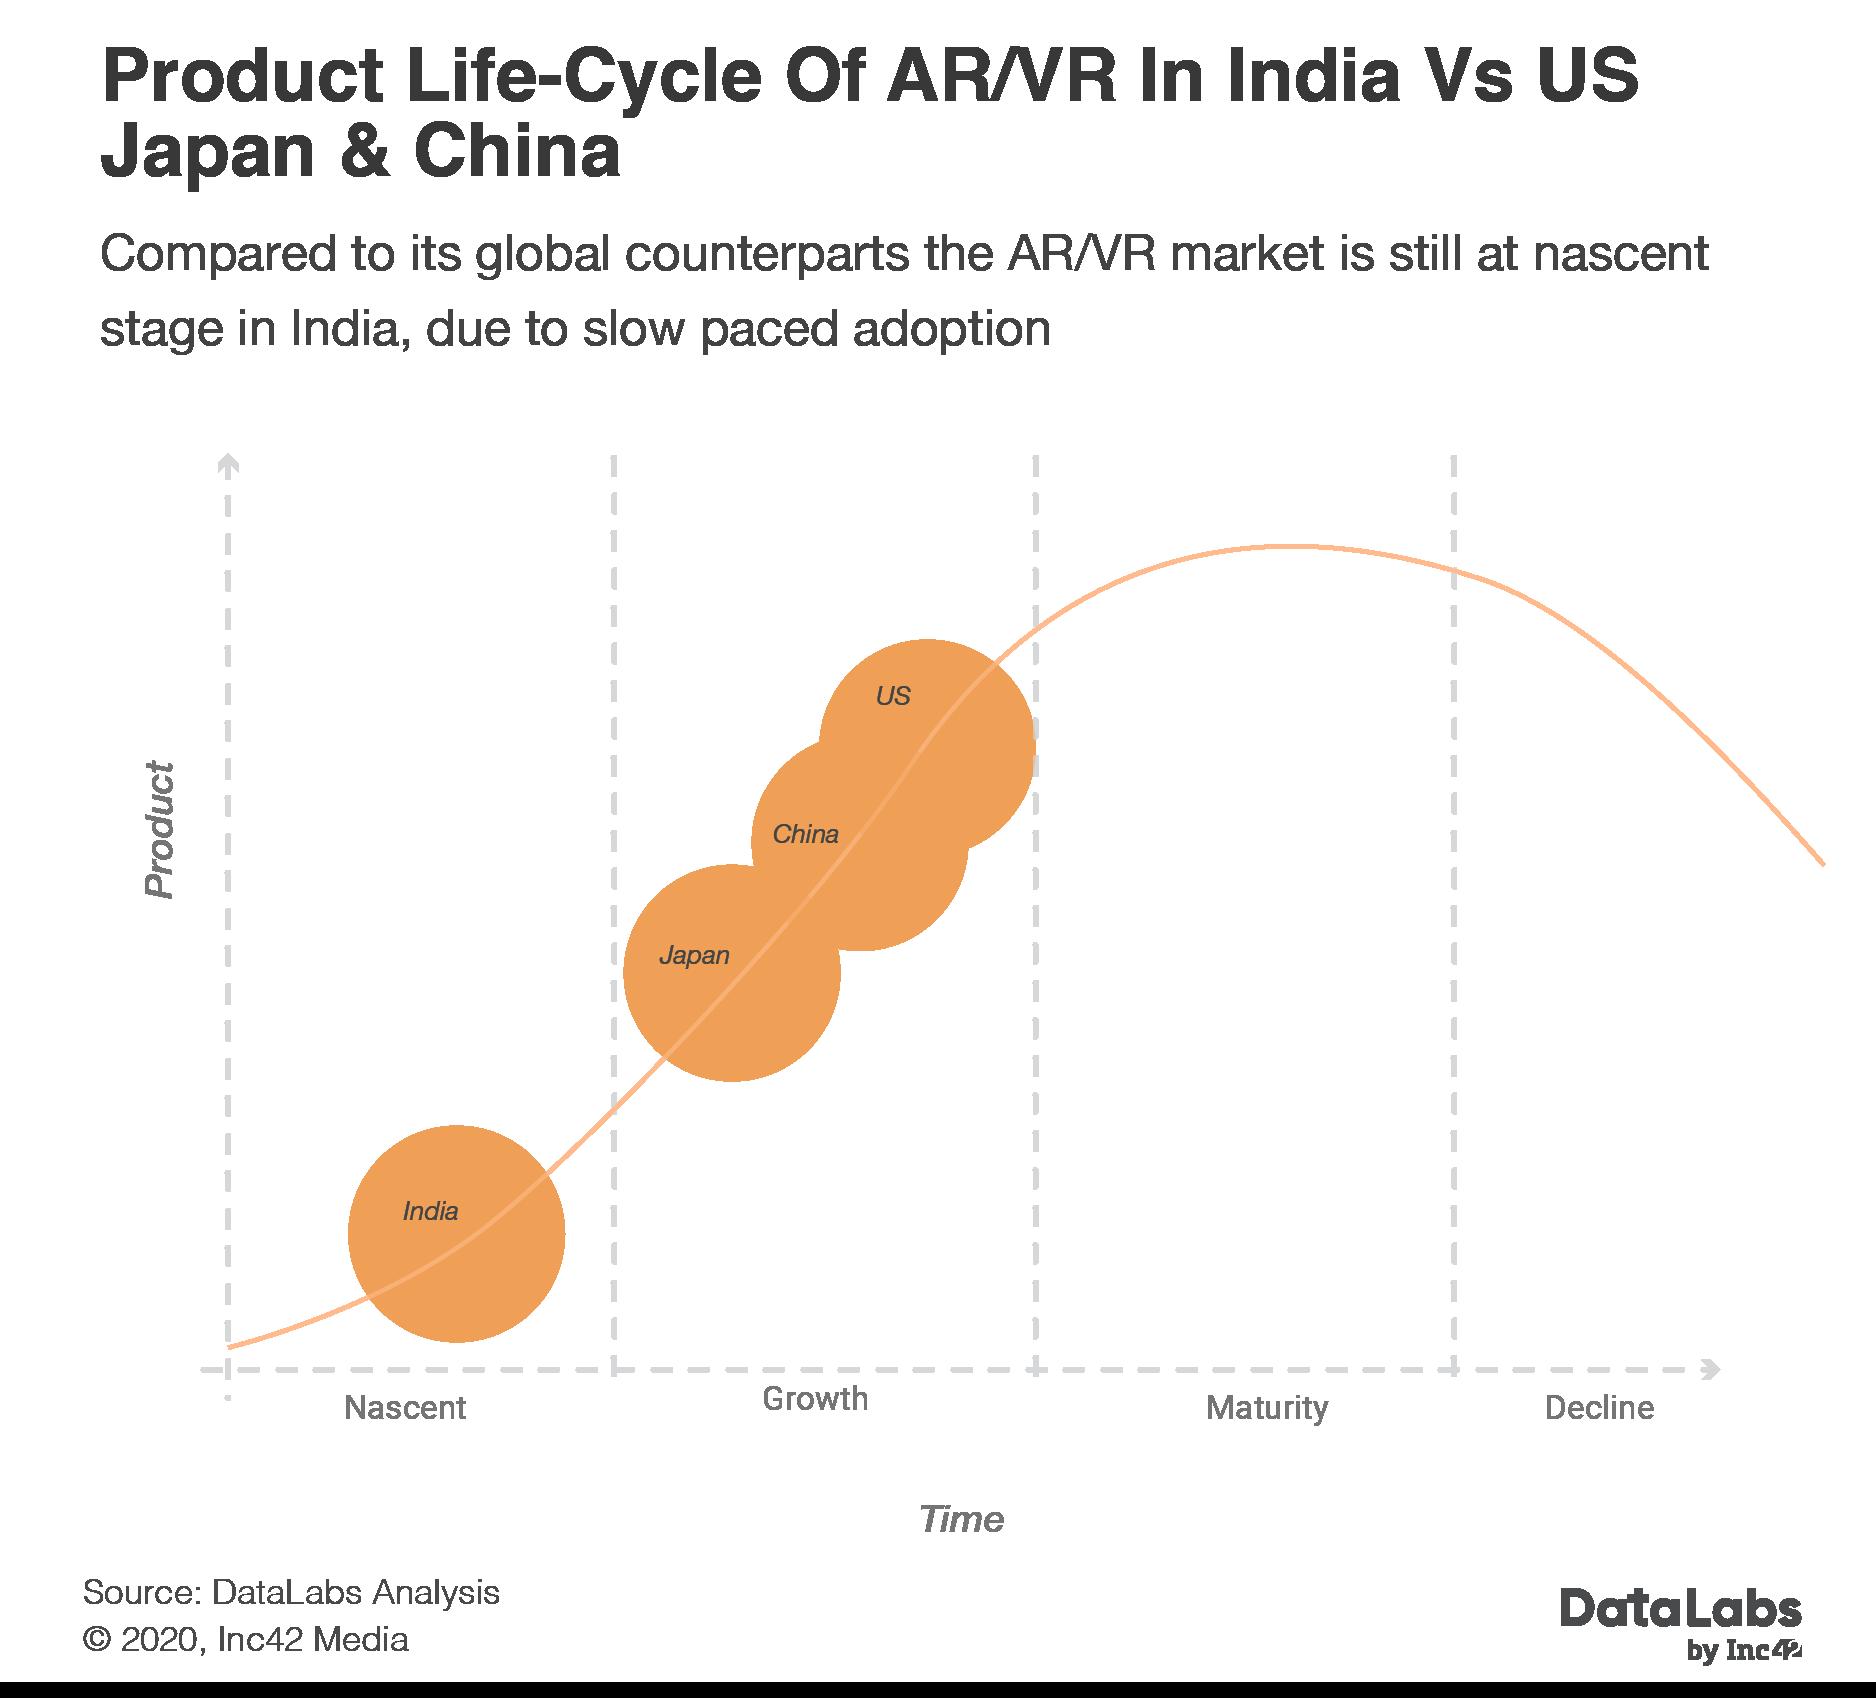 AR/VR market in India